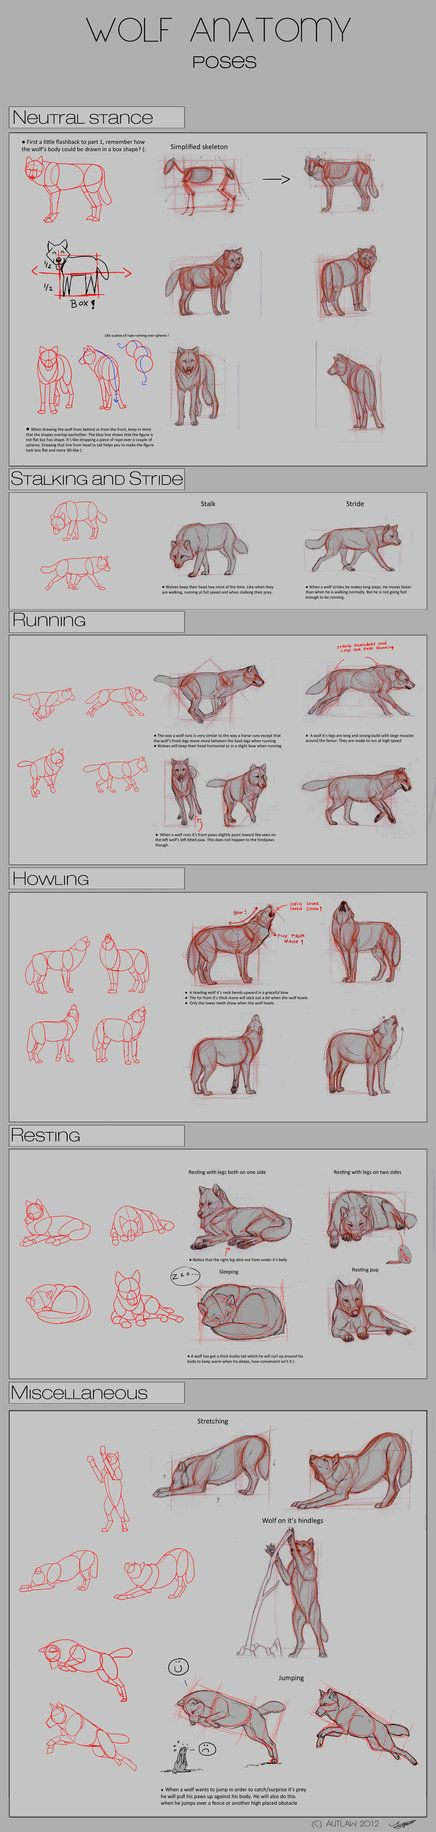 Wolf Anatomy - Part 2 by *Autlaw on deviantART | Animal Anatomy ...